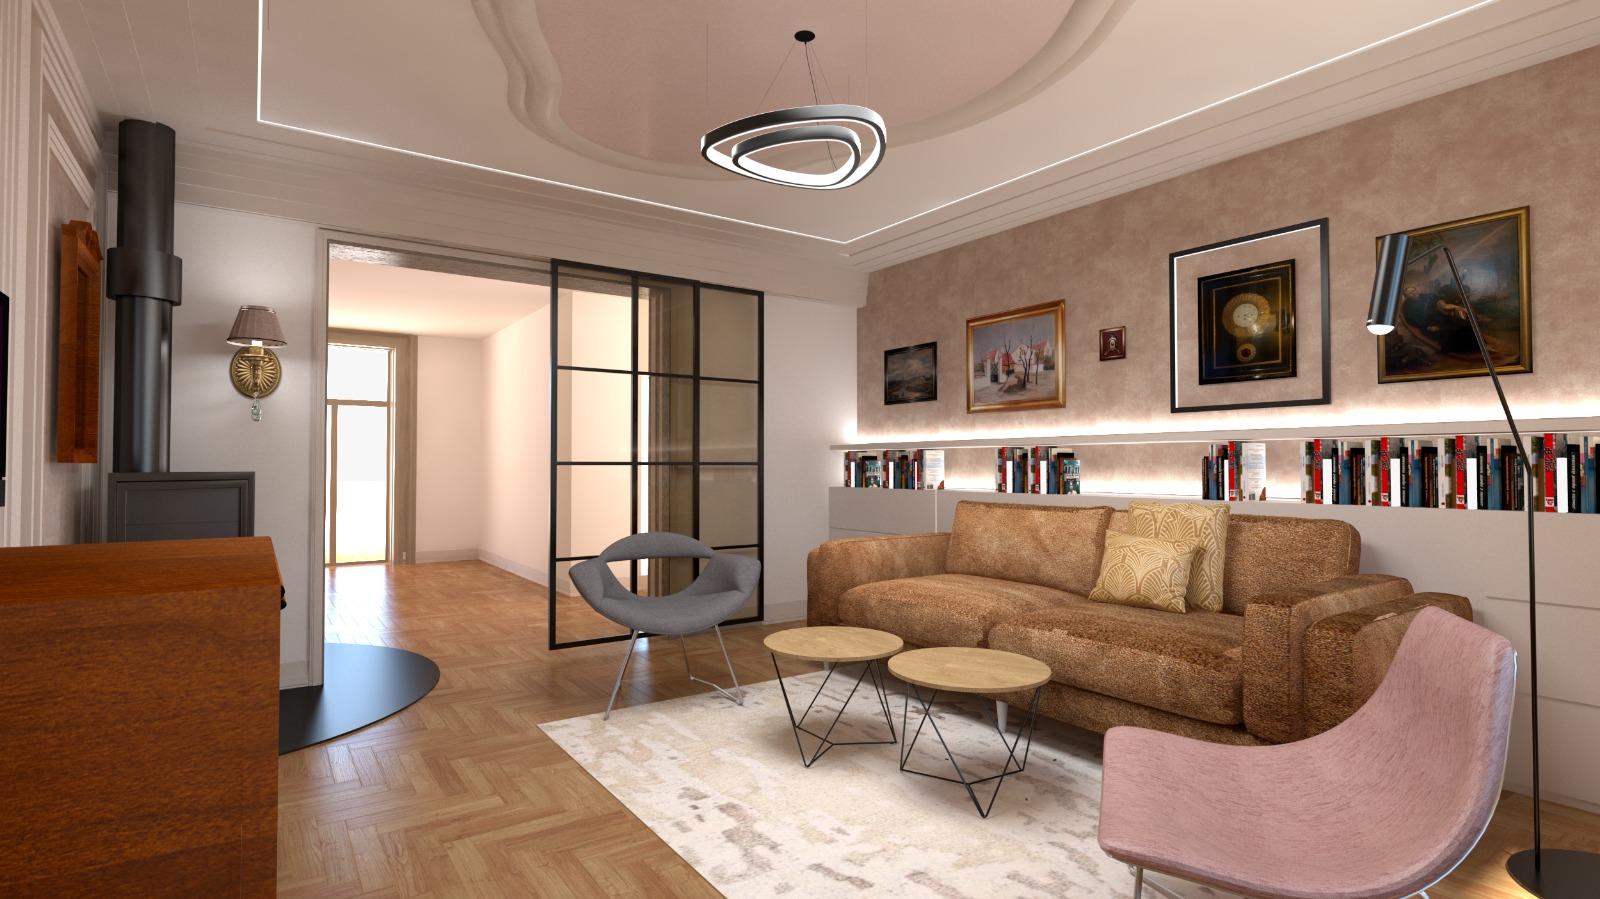 Návrh interiéru luxusního bytu v Praze1